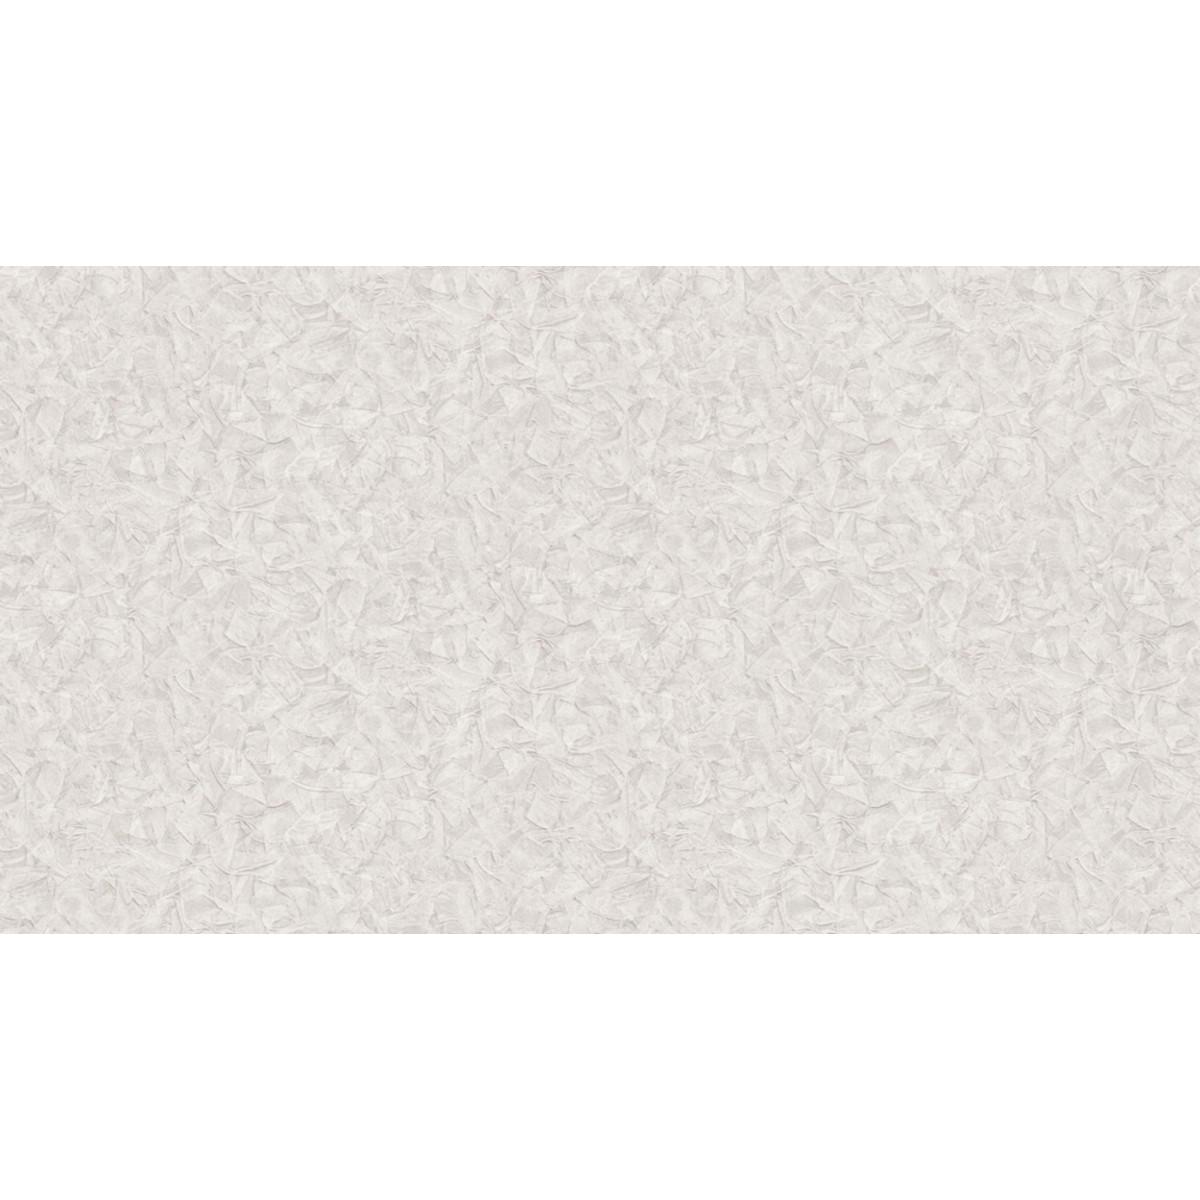 Обои флизелиновые Maxwall бежевые 1.06 м 159086-20